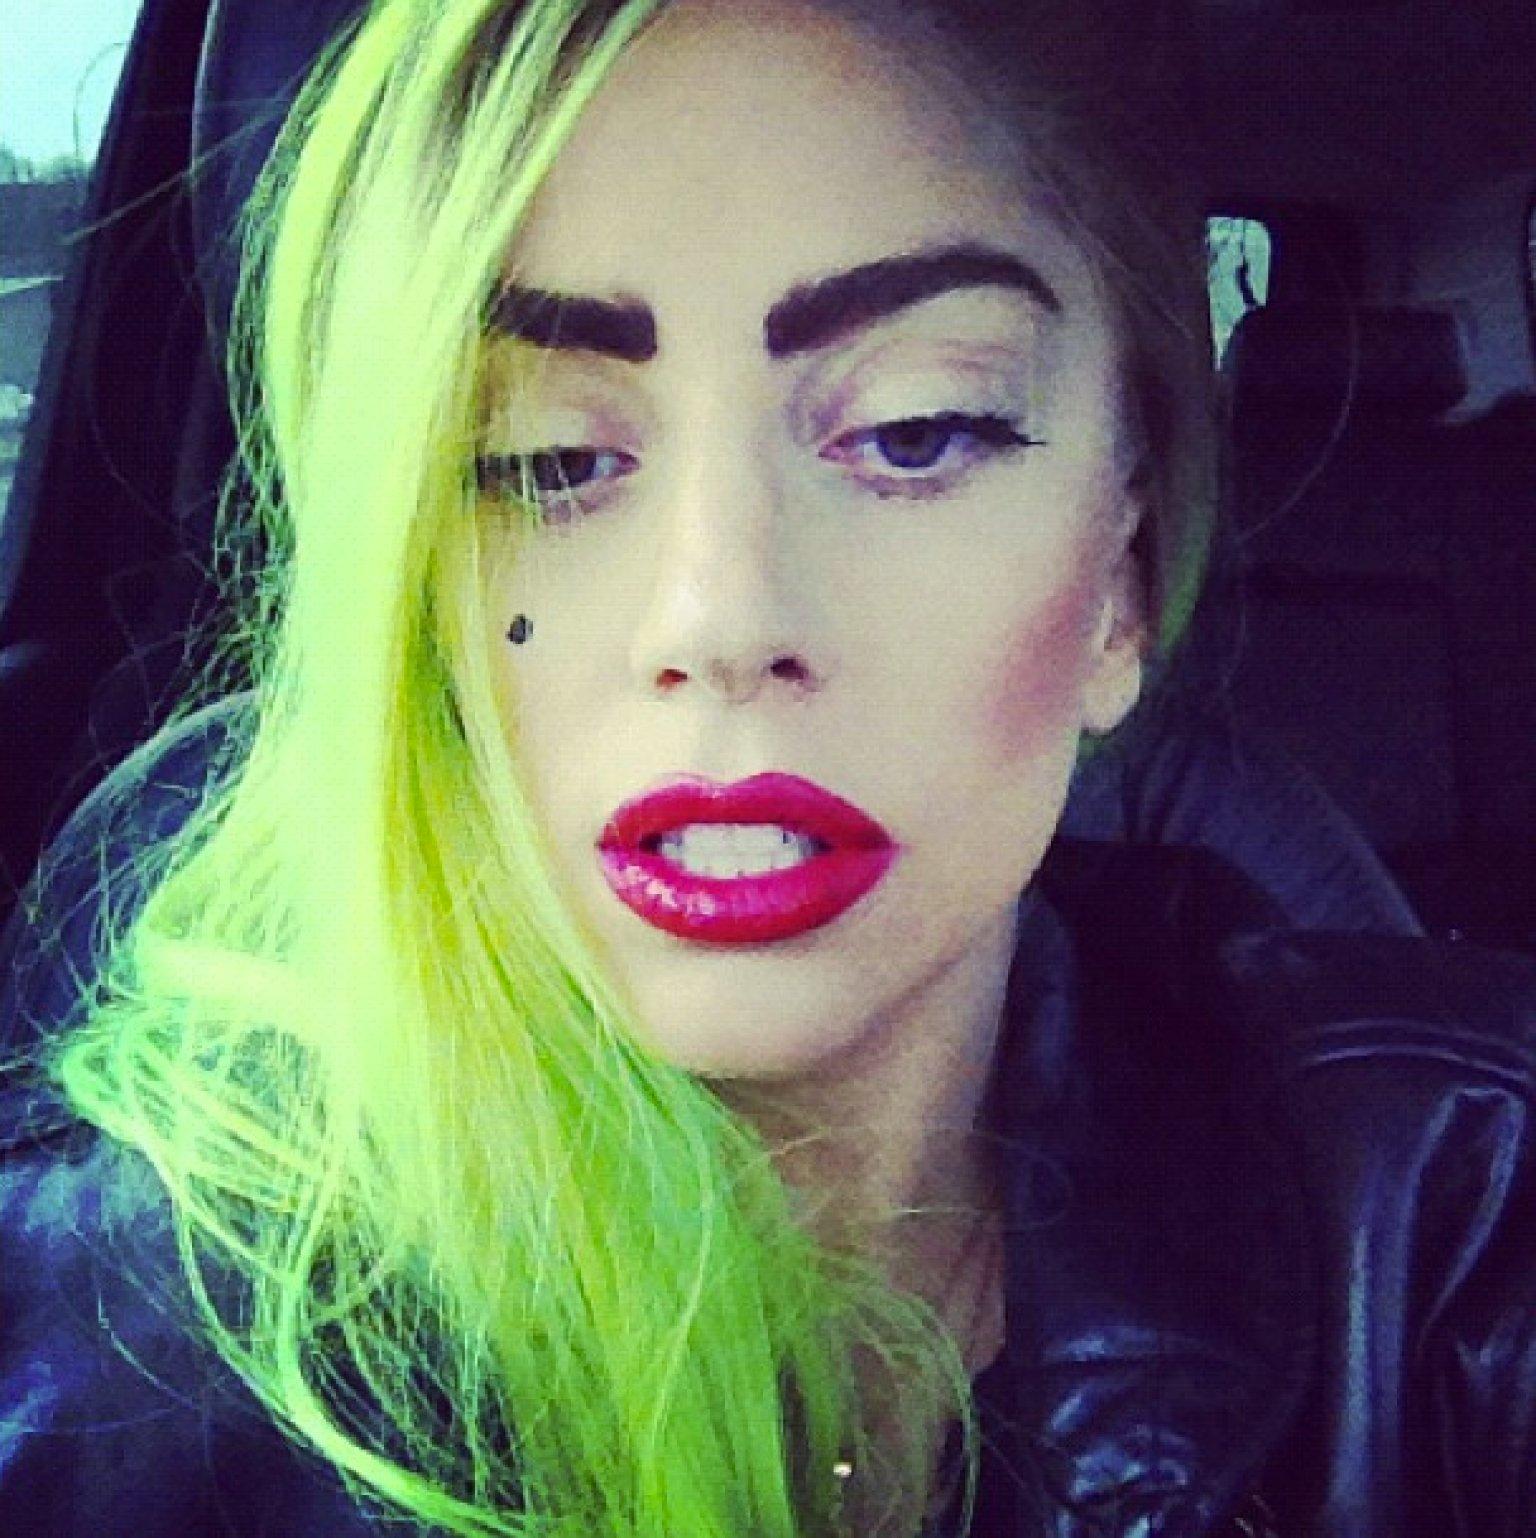 Lady Gaga: Lady Gaga Flaunts Fresh Face, Brunette Hair And Nose Ring